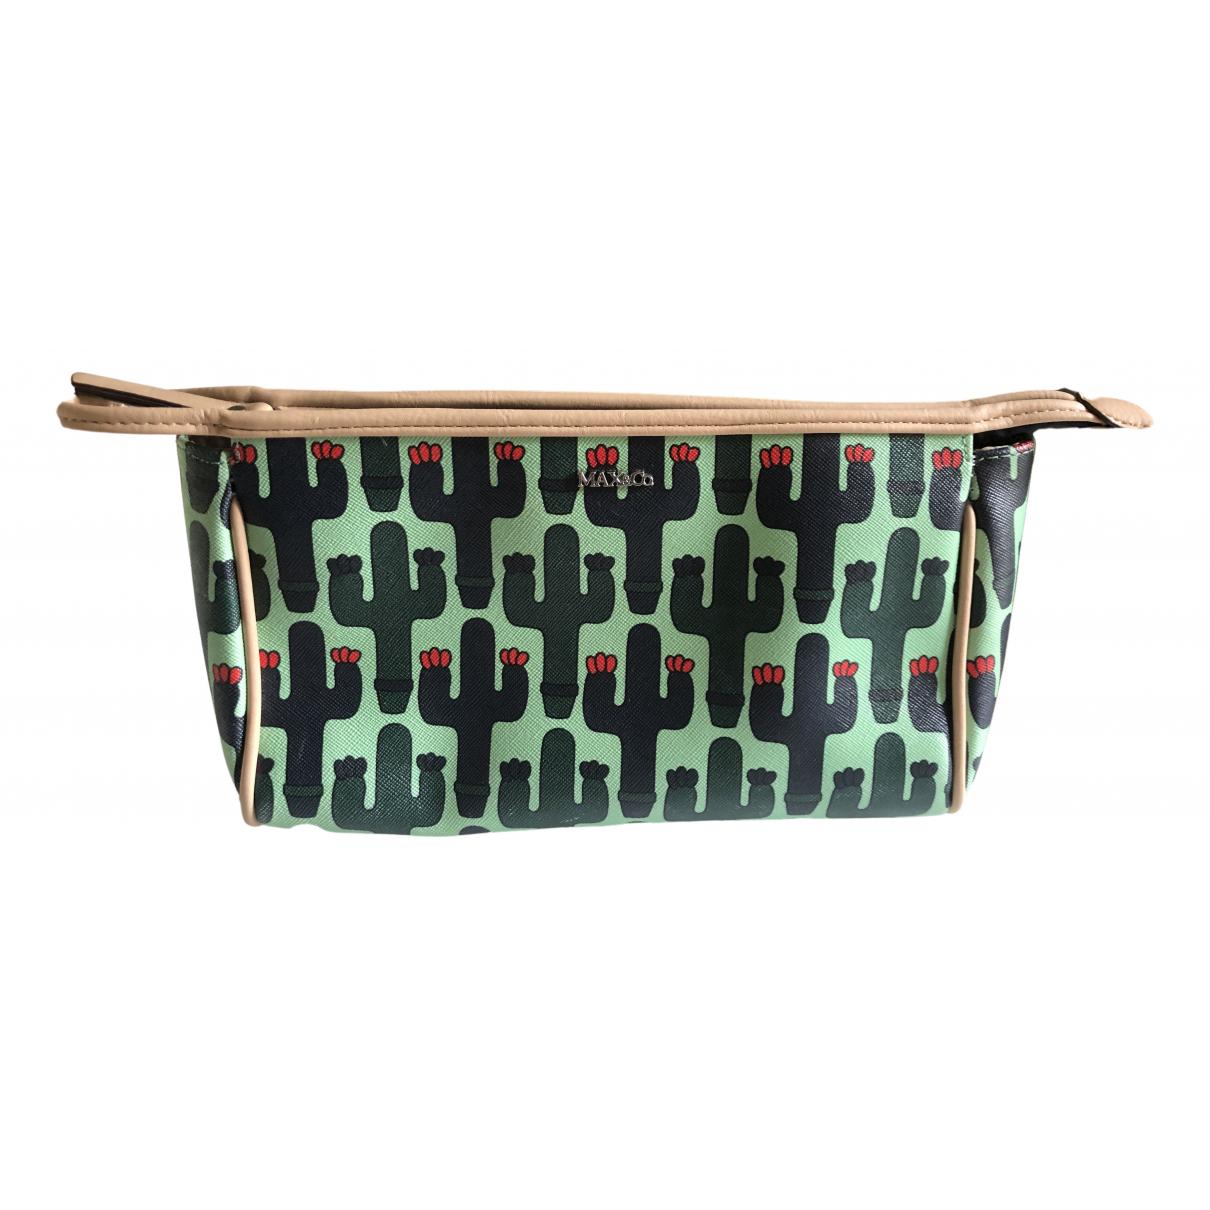 Max & Co - Petite maroquinerie   pour femme - vert